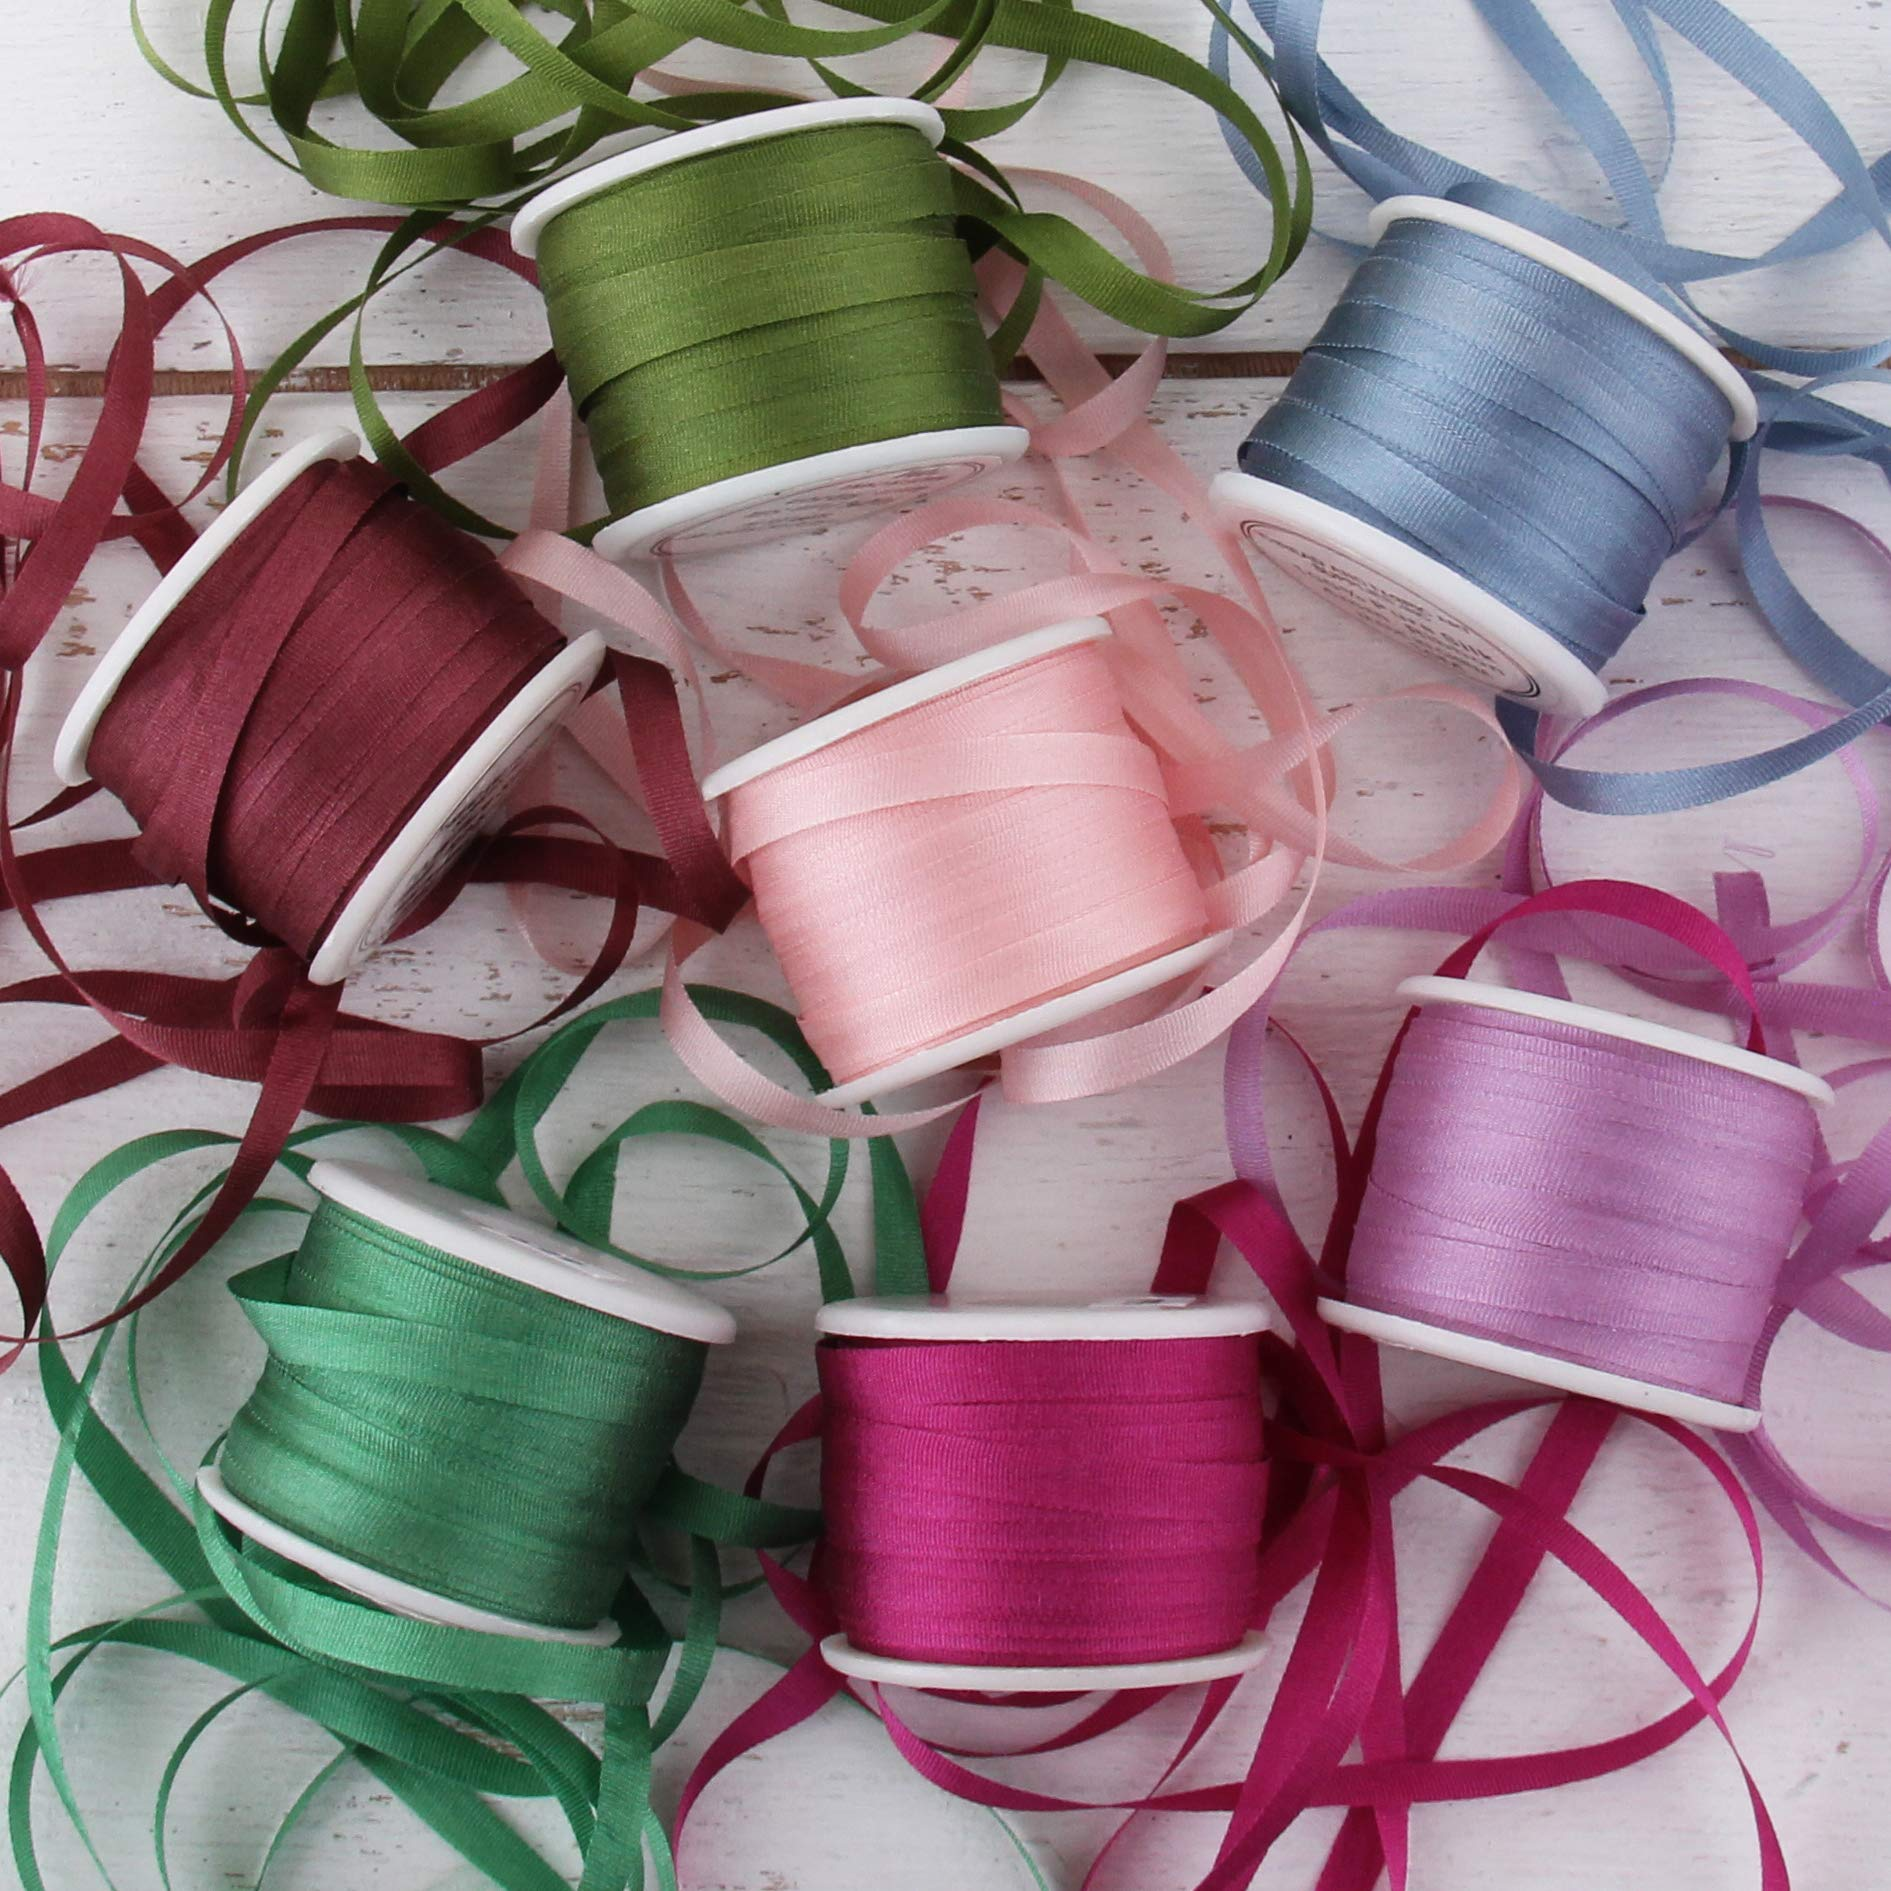 ThreadNanny New 20 Spools of 100/% Pure Silk Ribbons 4mm x 10 Meters